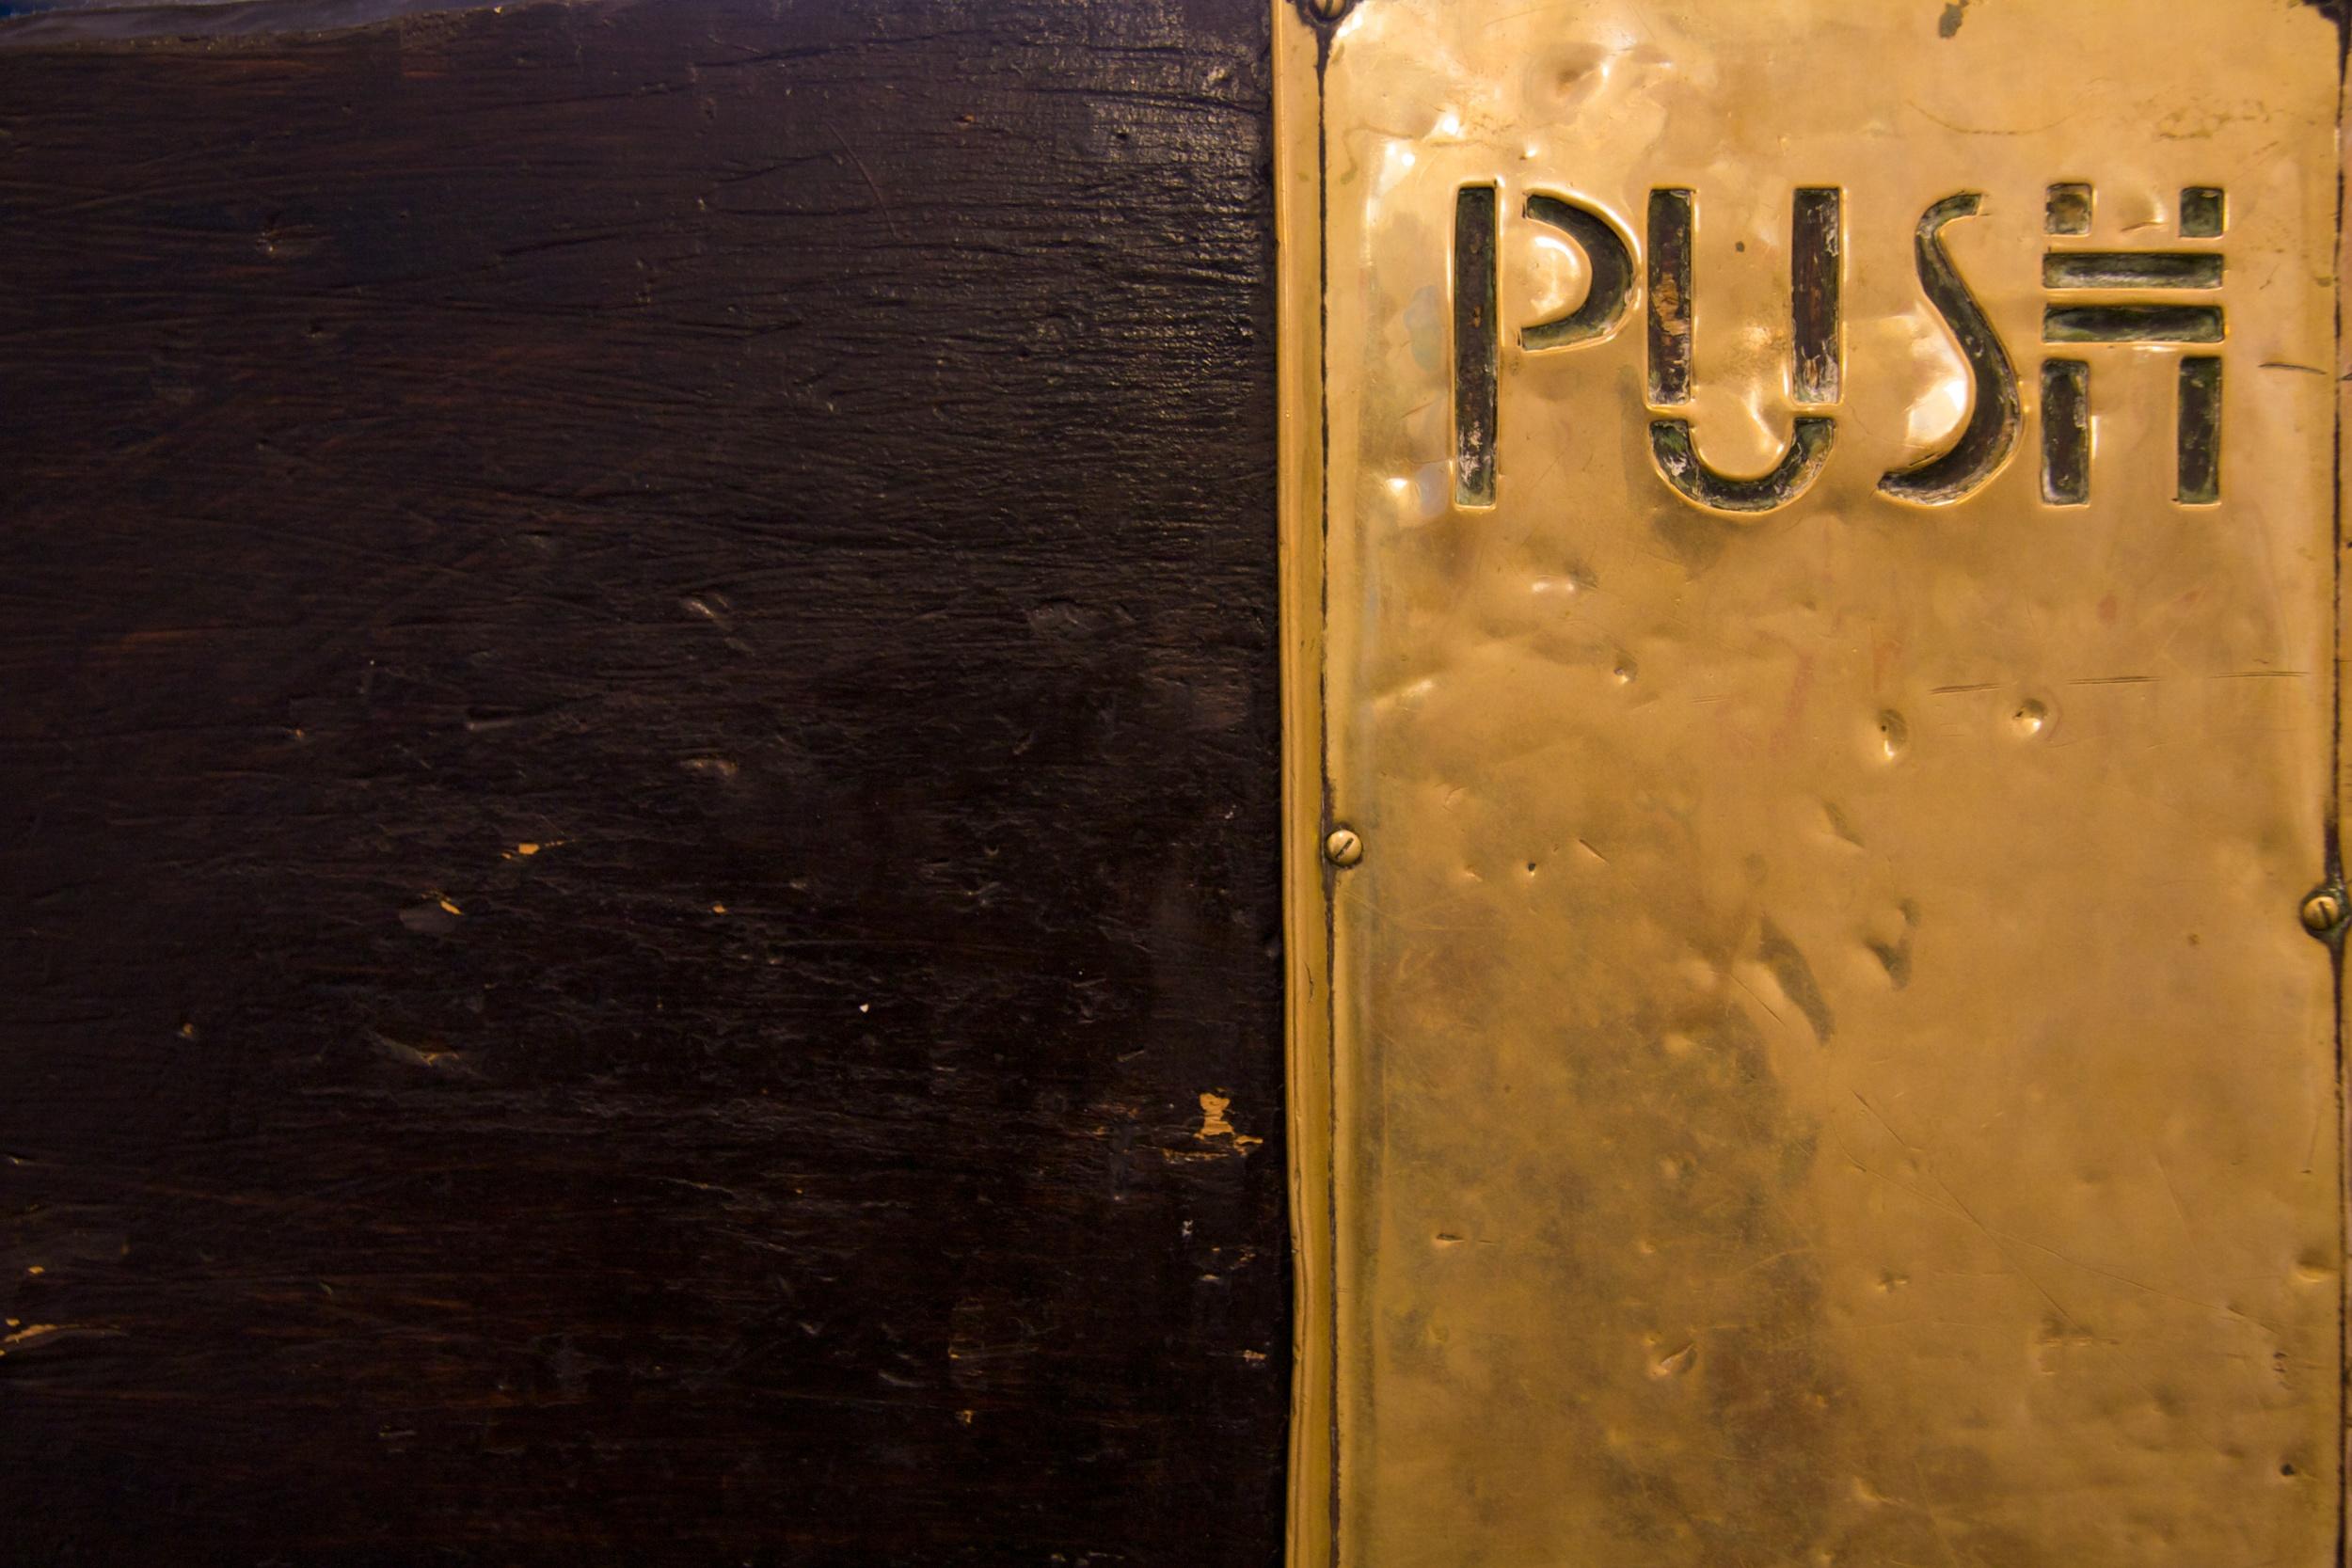 Push (Charles Rennie Mackintosh), Glasgow School of Art. Photo: Erinç Salor